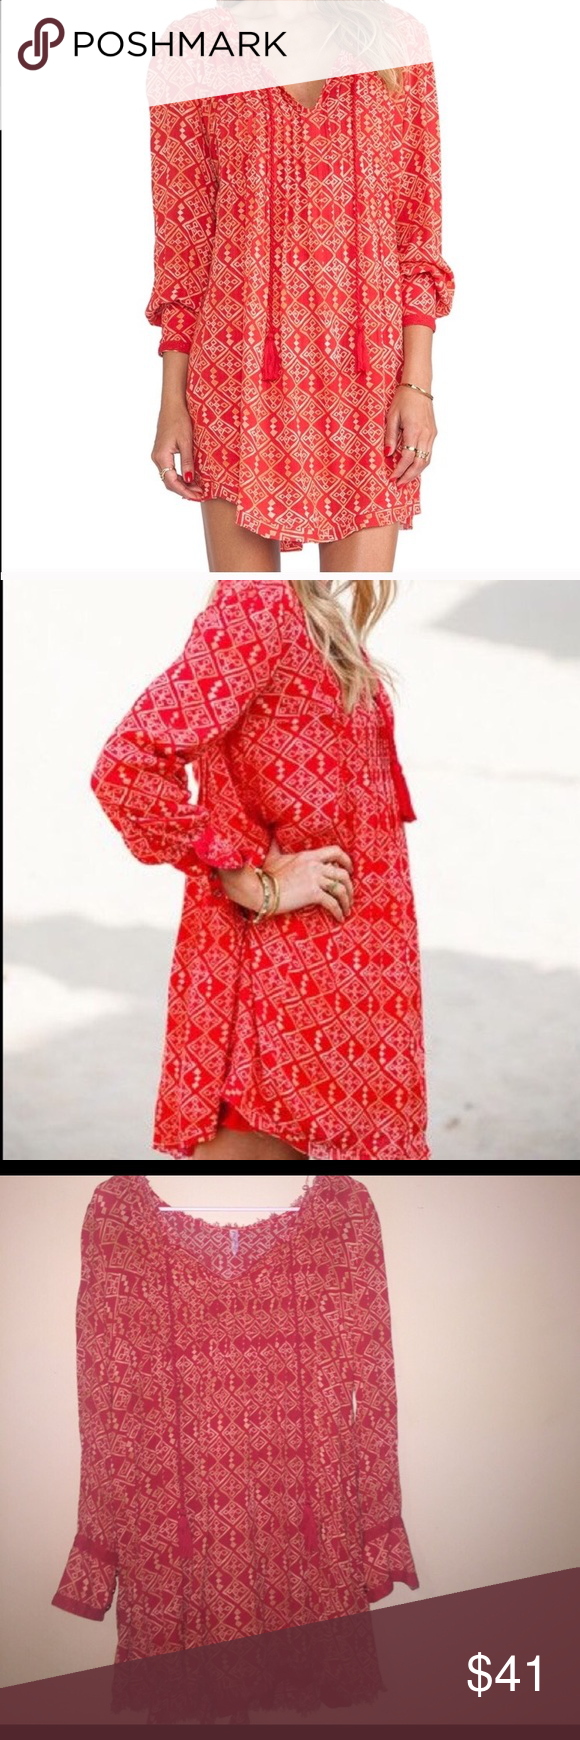 Free people flowy red long sleeve dress